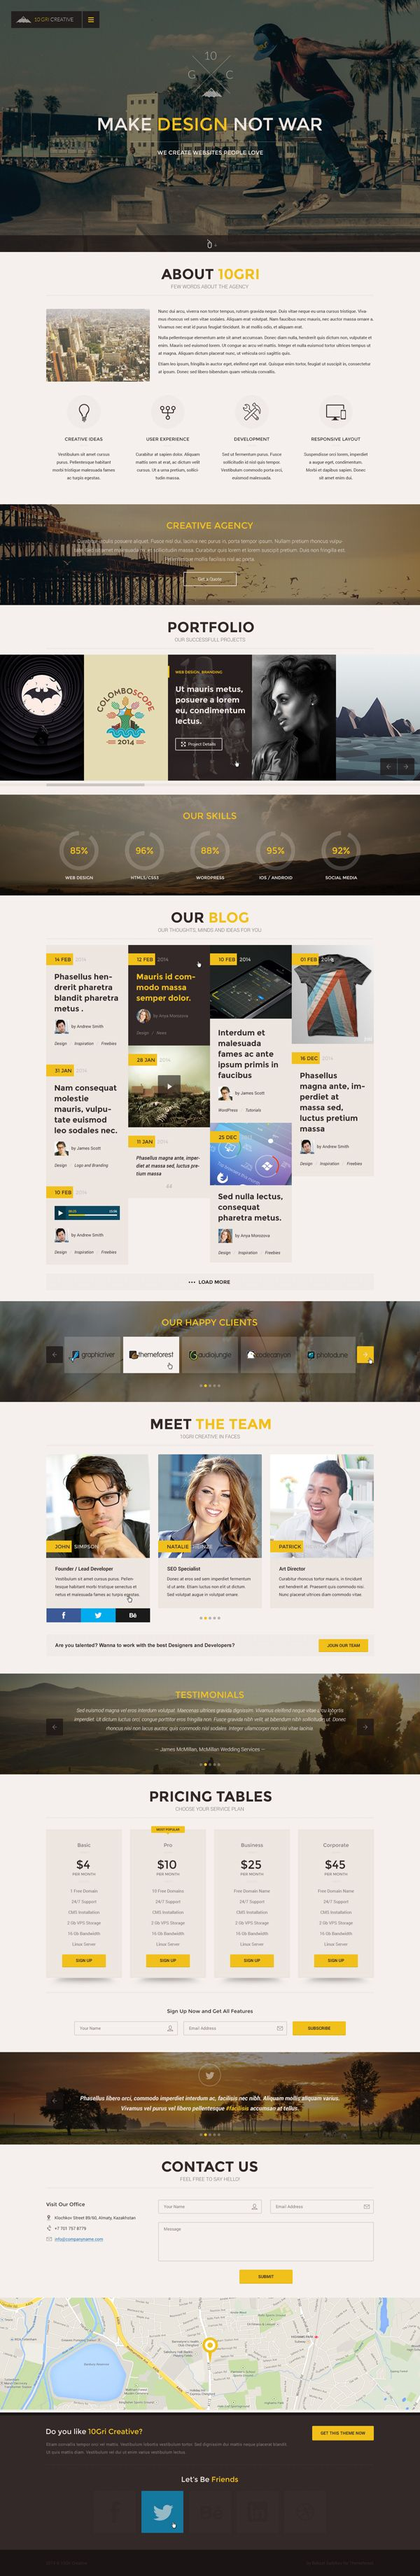 105GriCreative - OnePage PSD HTML5 Theme  #html5templates #psdtemplates